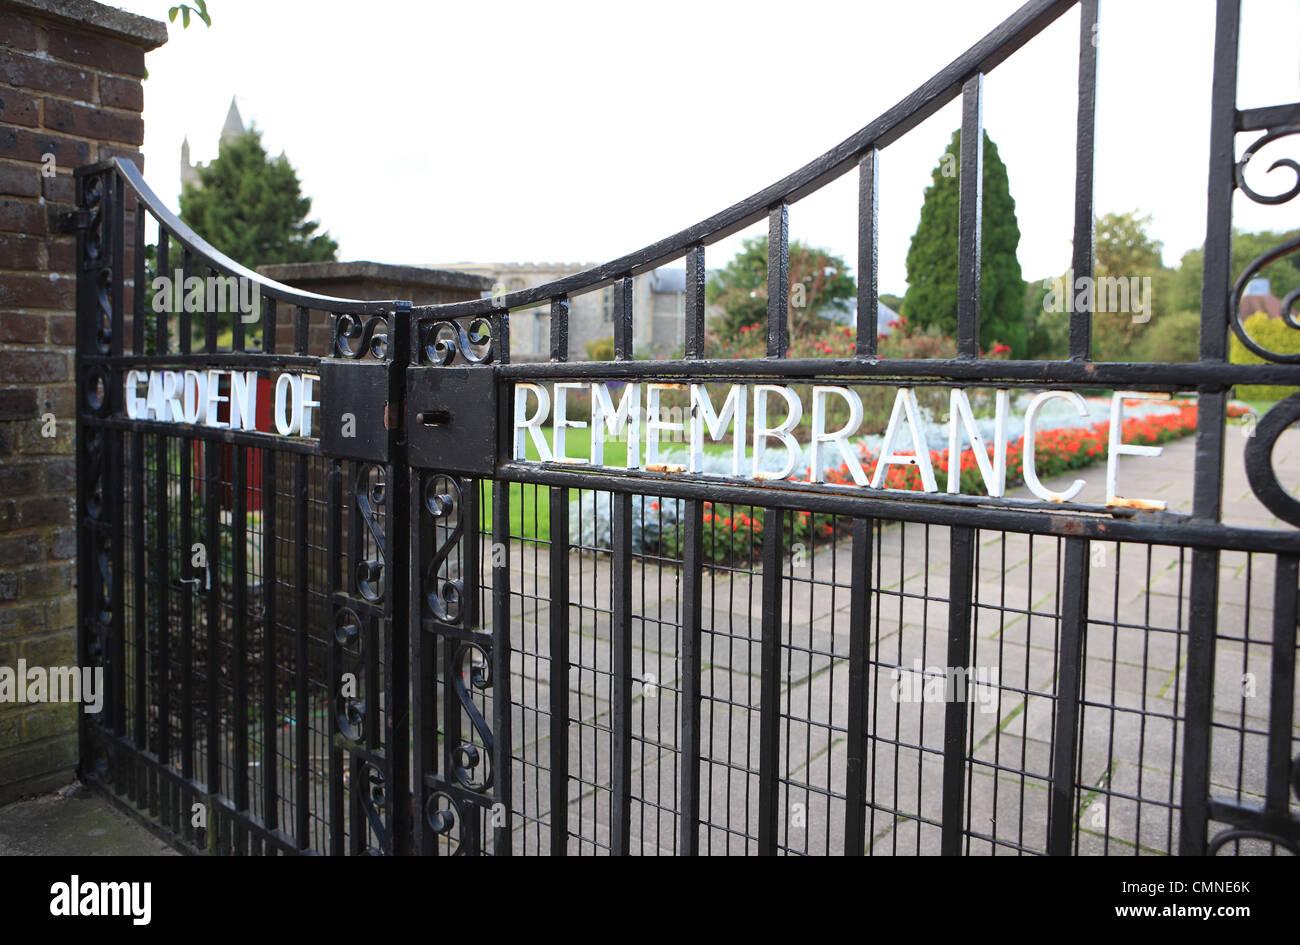 Garden of Remembrance written on entrance gates - Stock Image